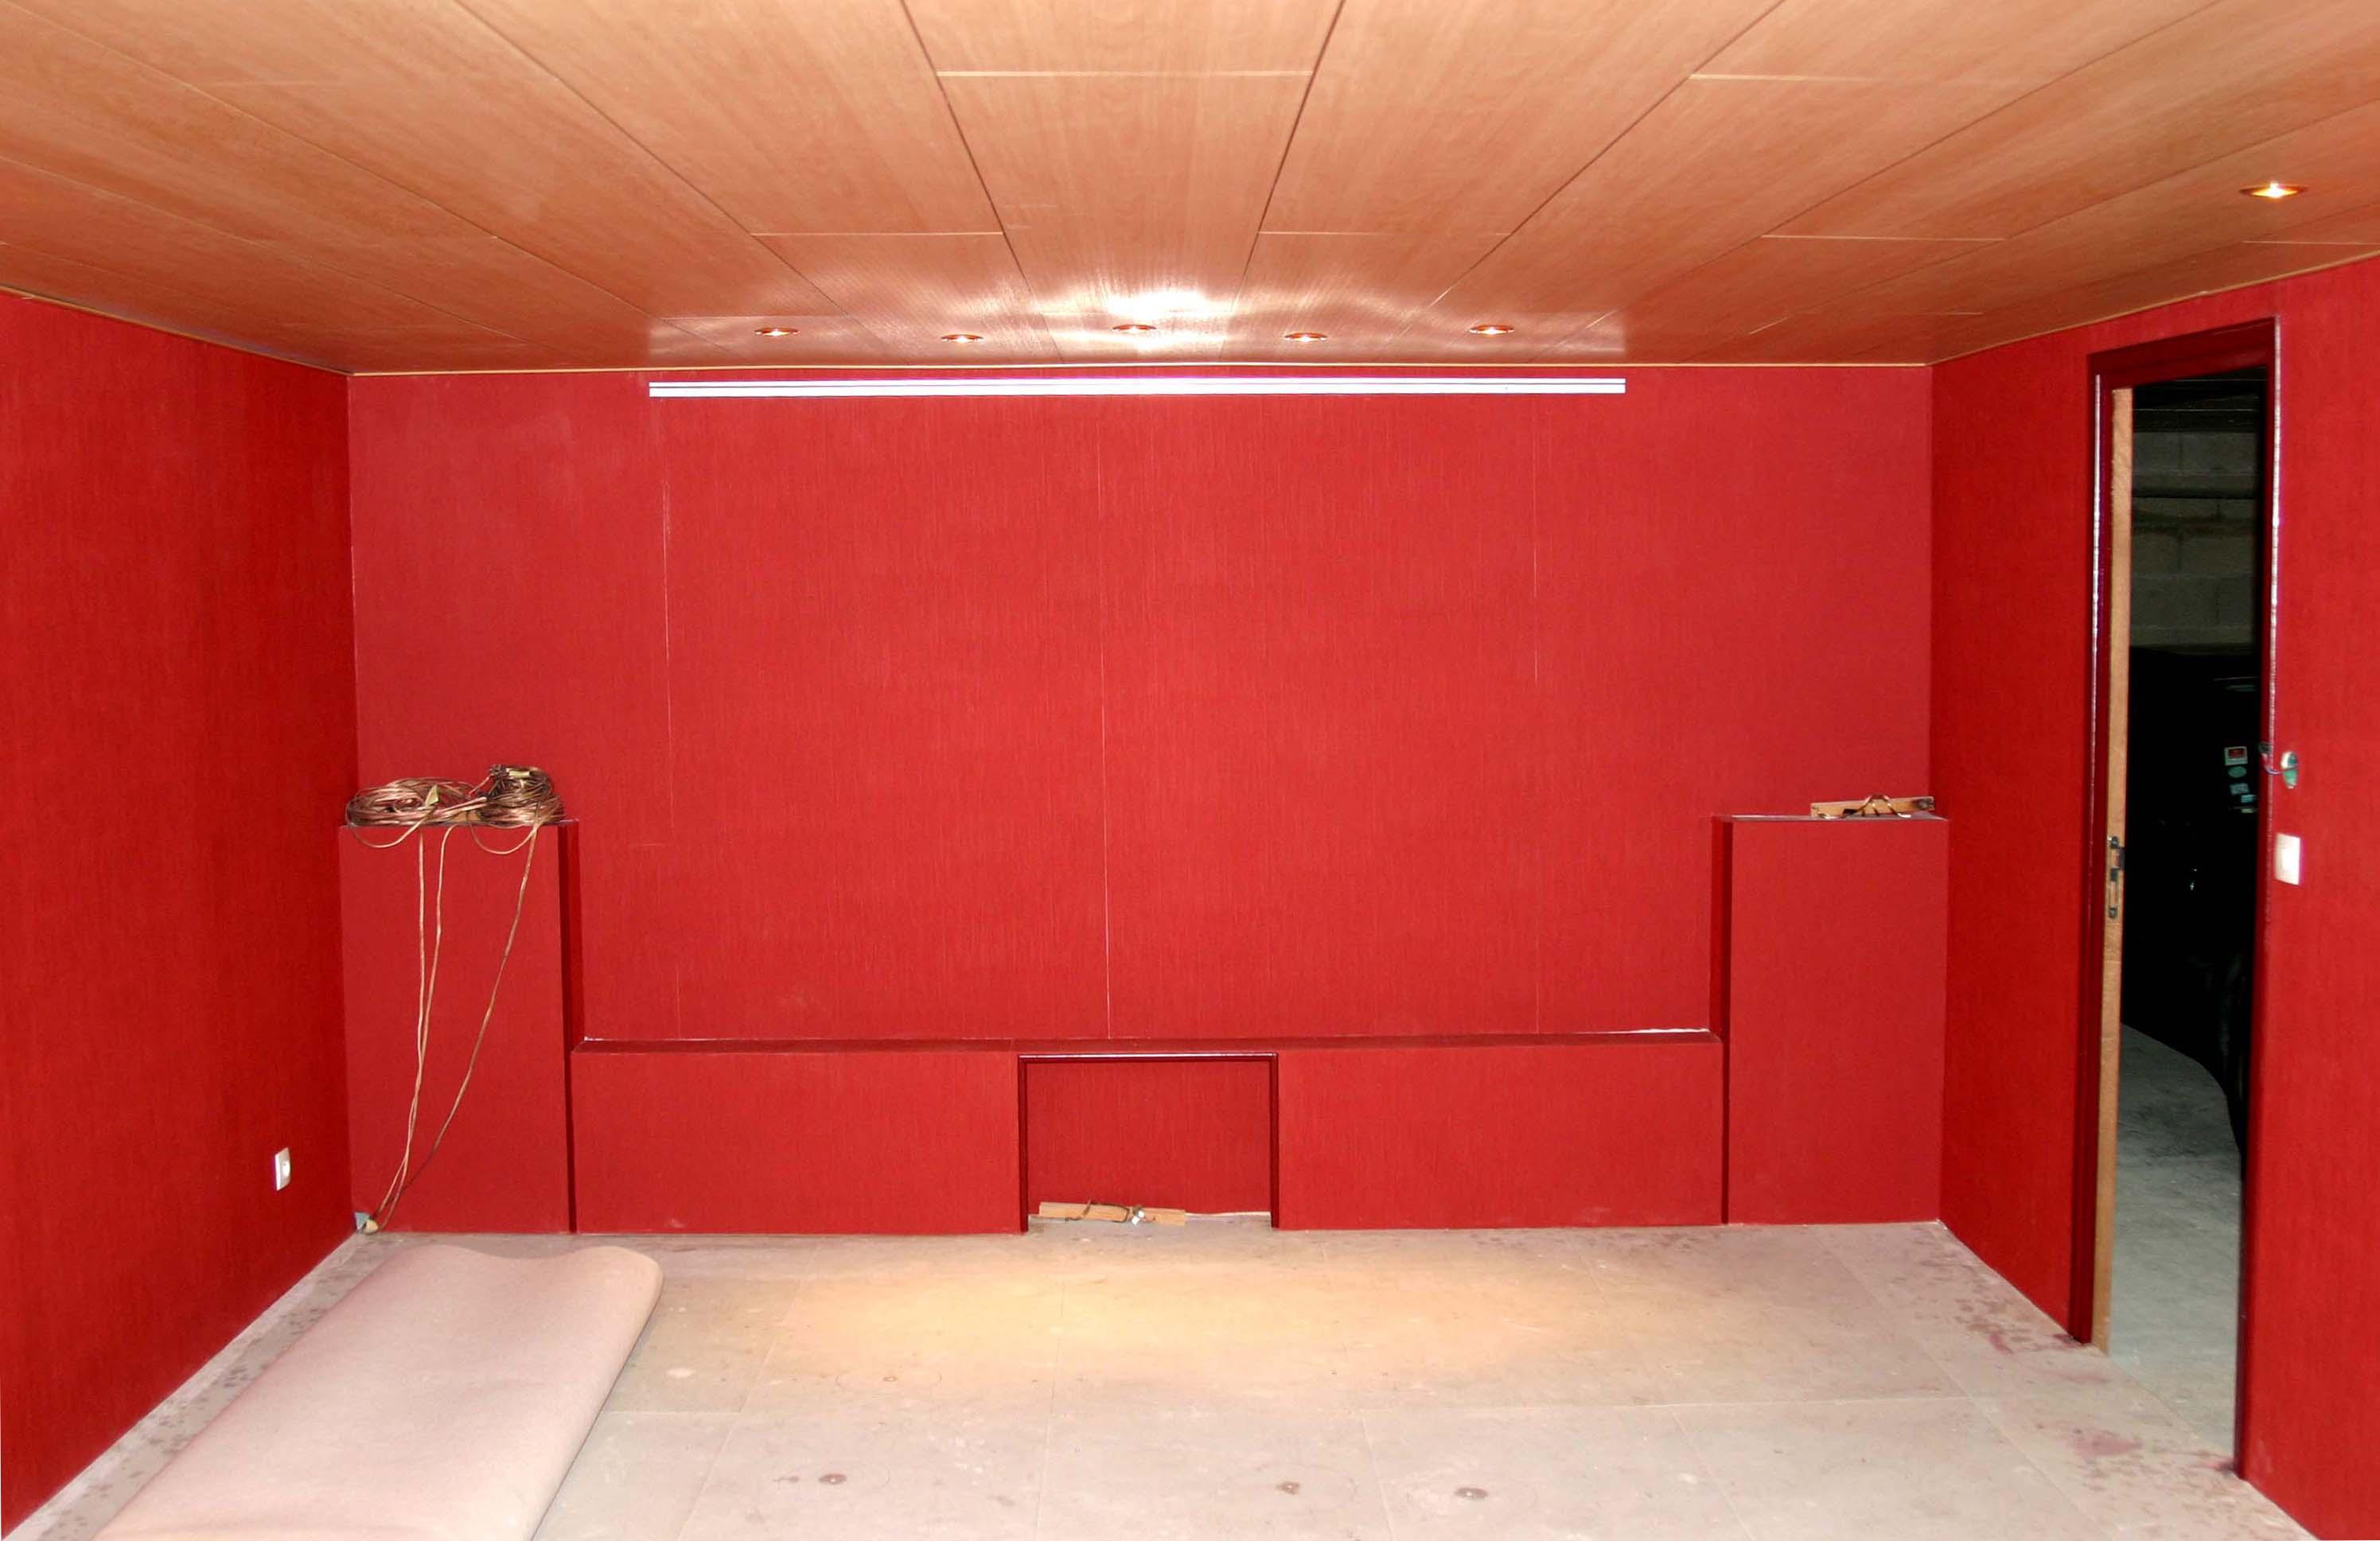 les finitions 1 2. Black Bedroom Furniture Sets. Home Design Ideas